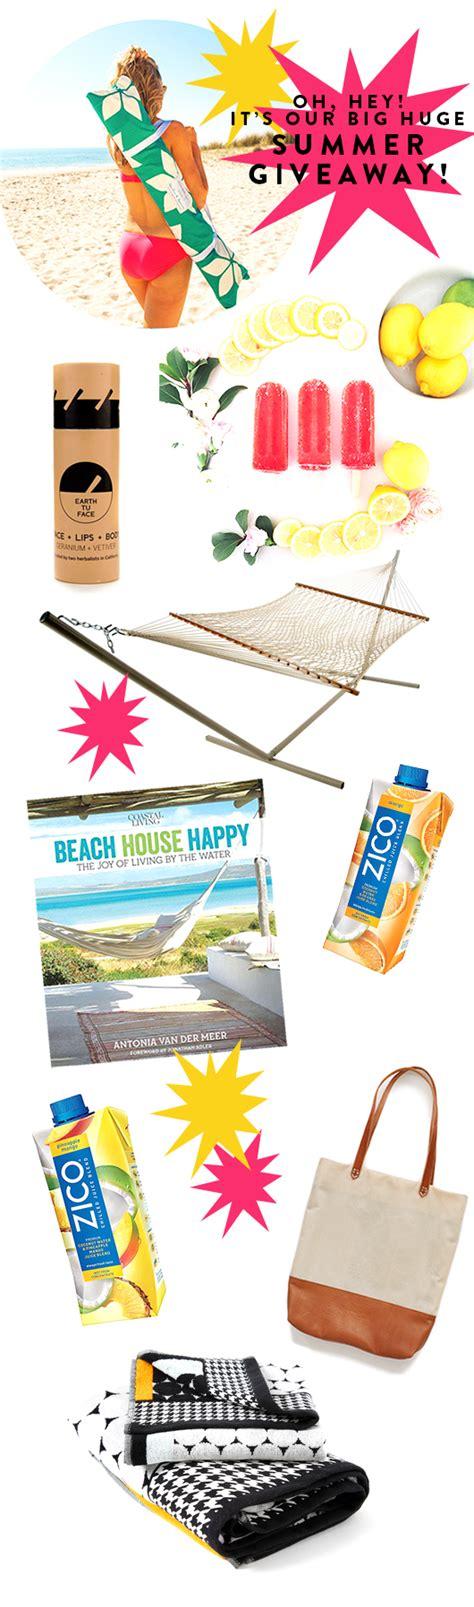 Huge Summer Giveaway - it s the big huge summer giveaway sfgirlbybay